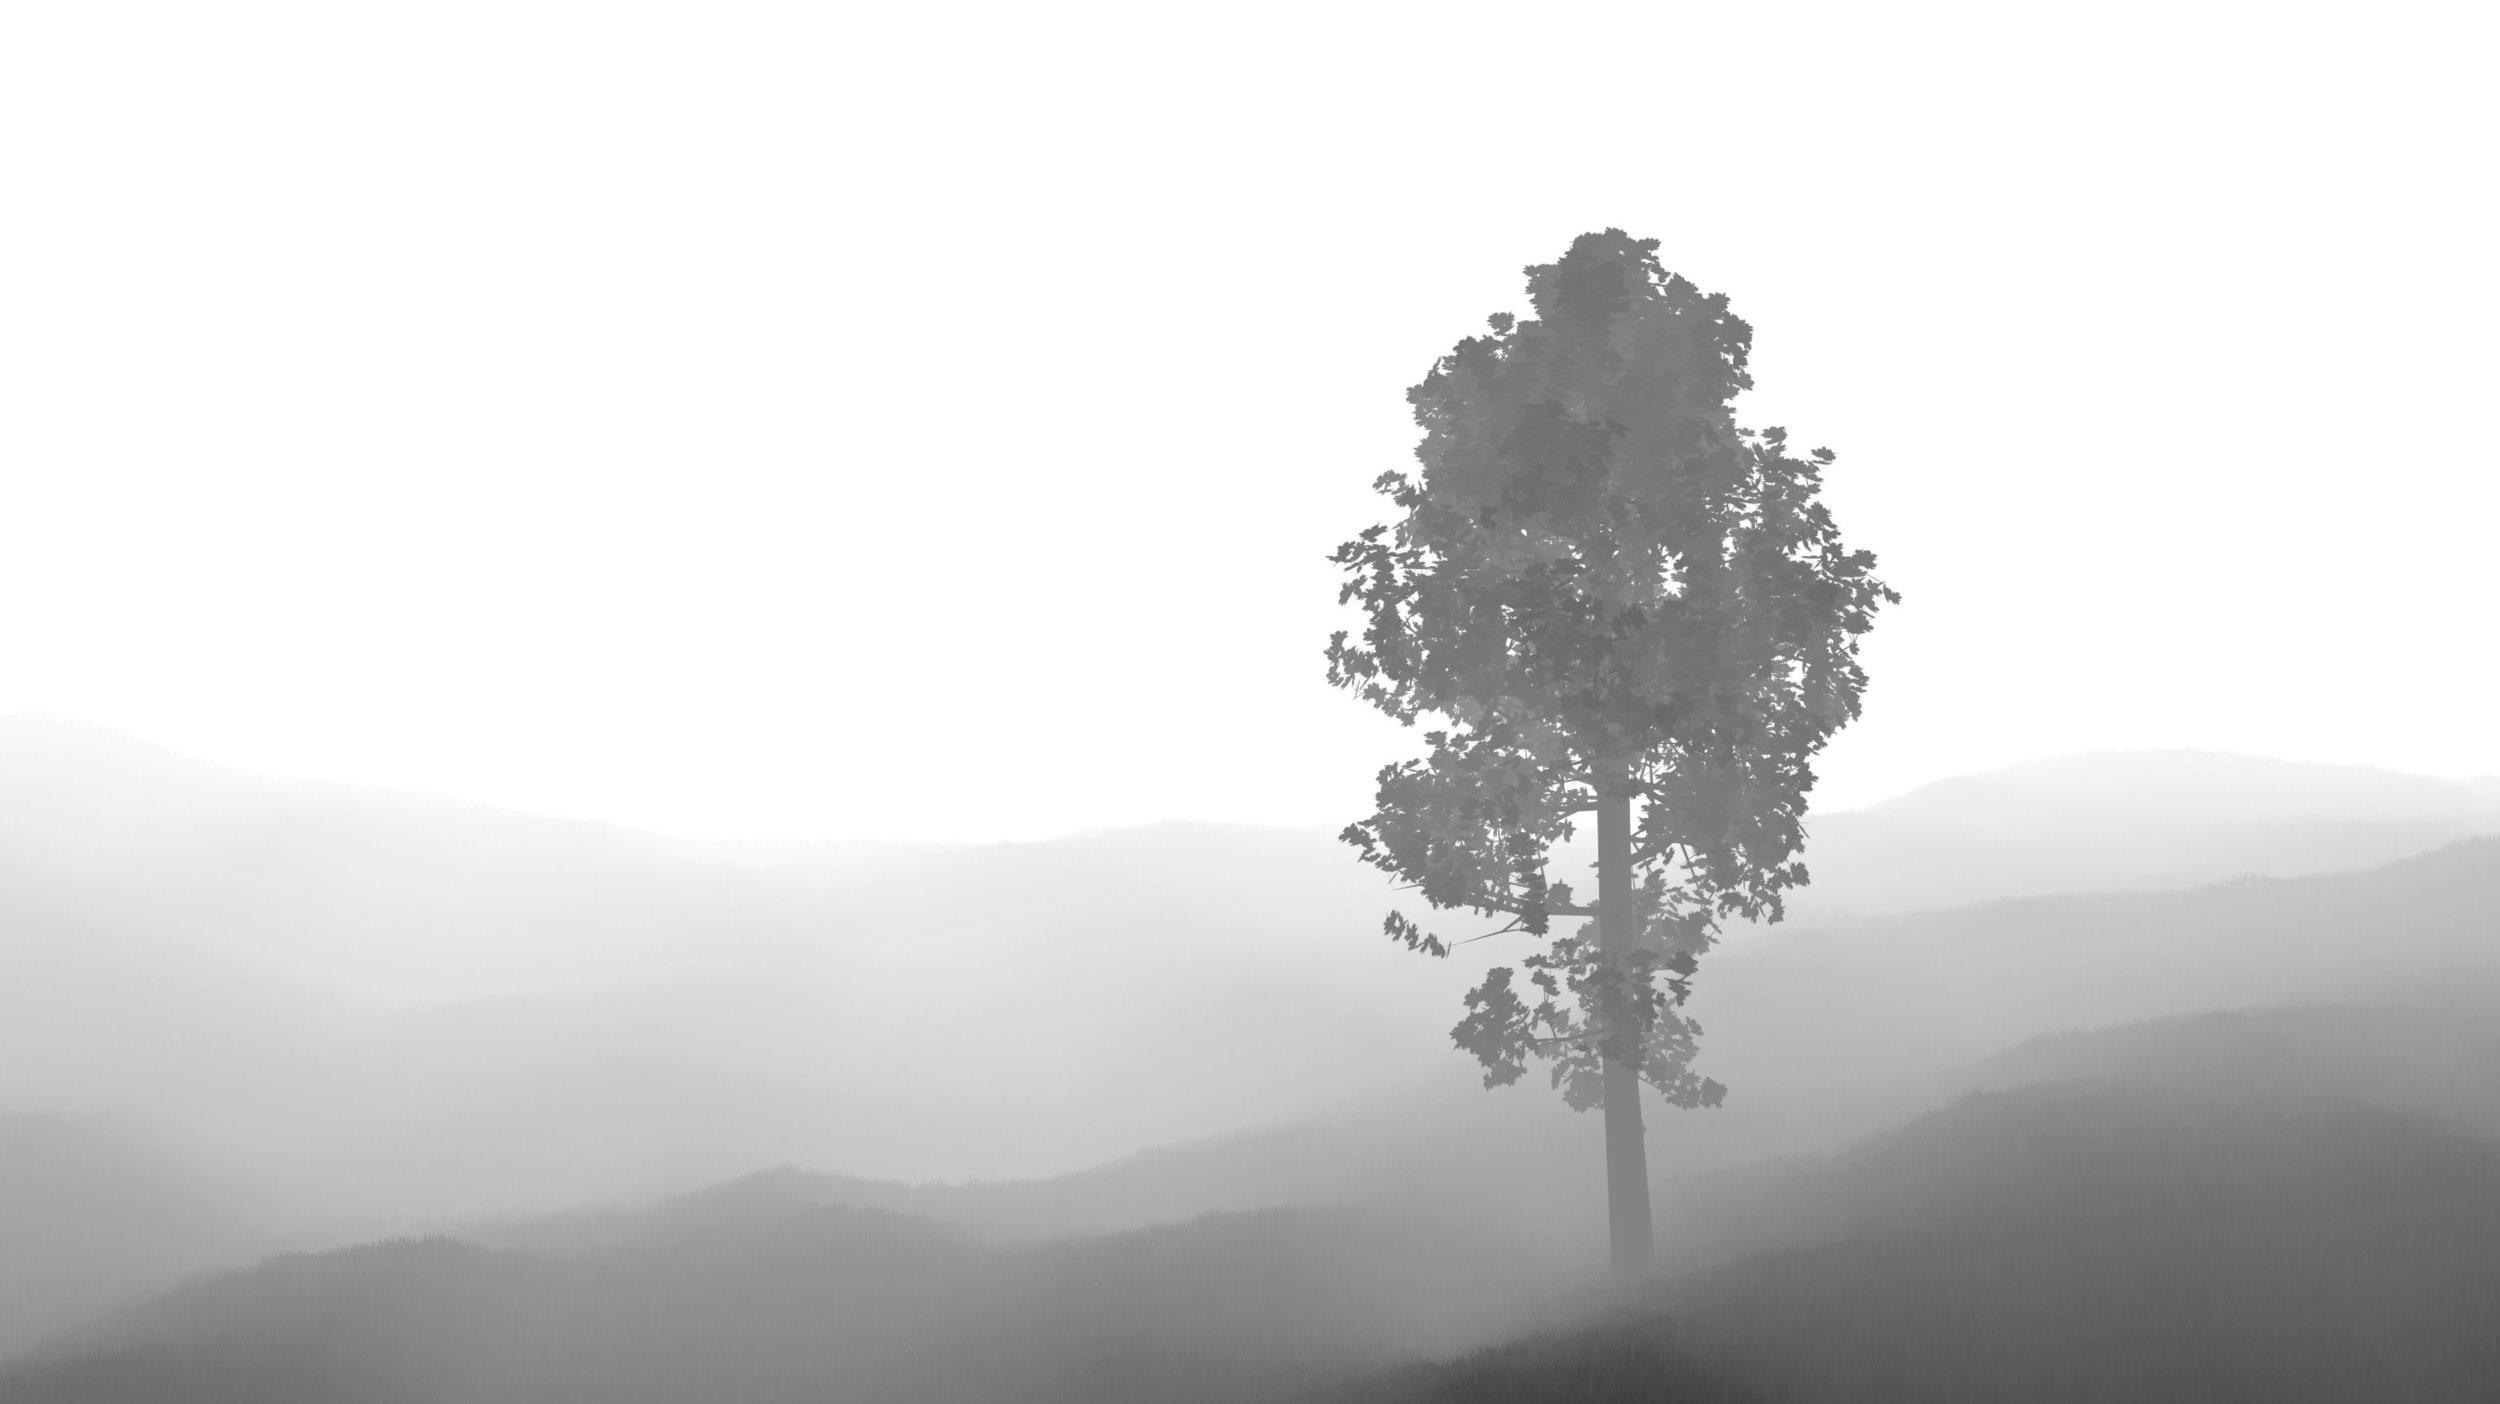 Tree model by Kentoshin